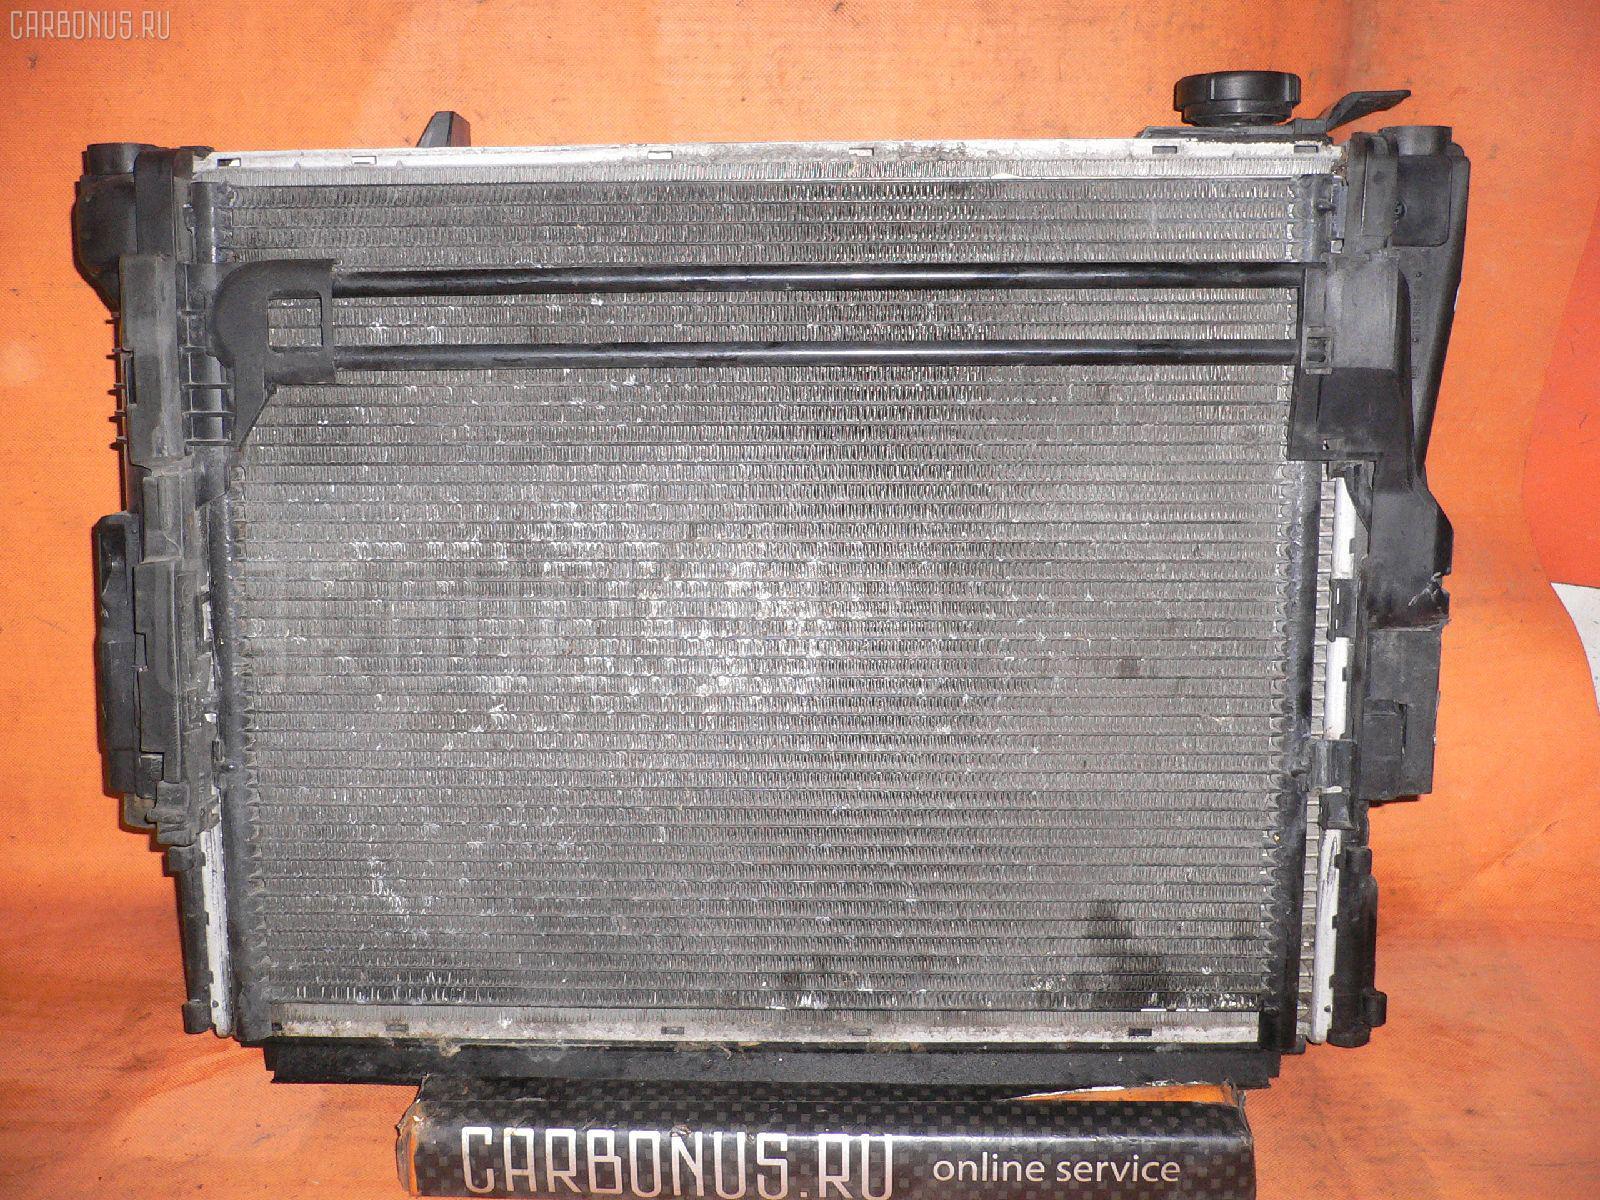 Радиатор ДВС BMW 3-SERIES E46-AV12 M54-226S1 Фото 4